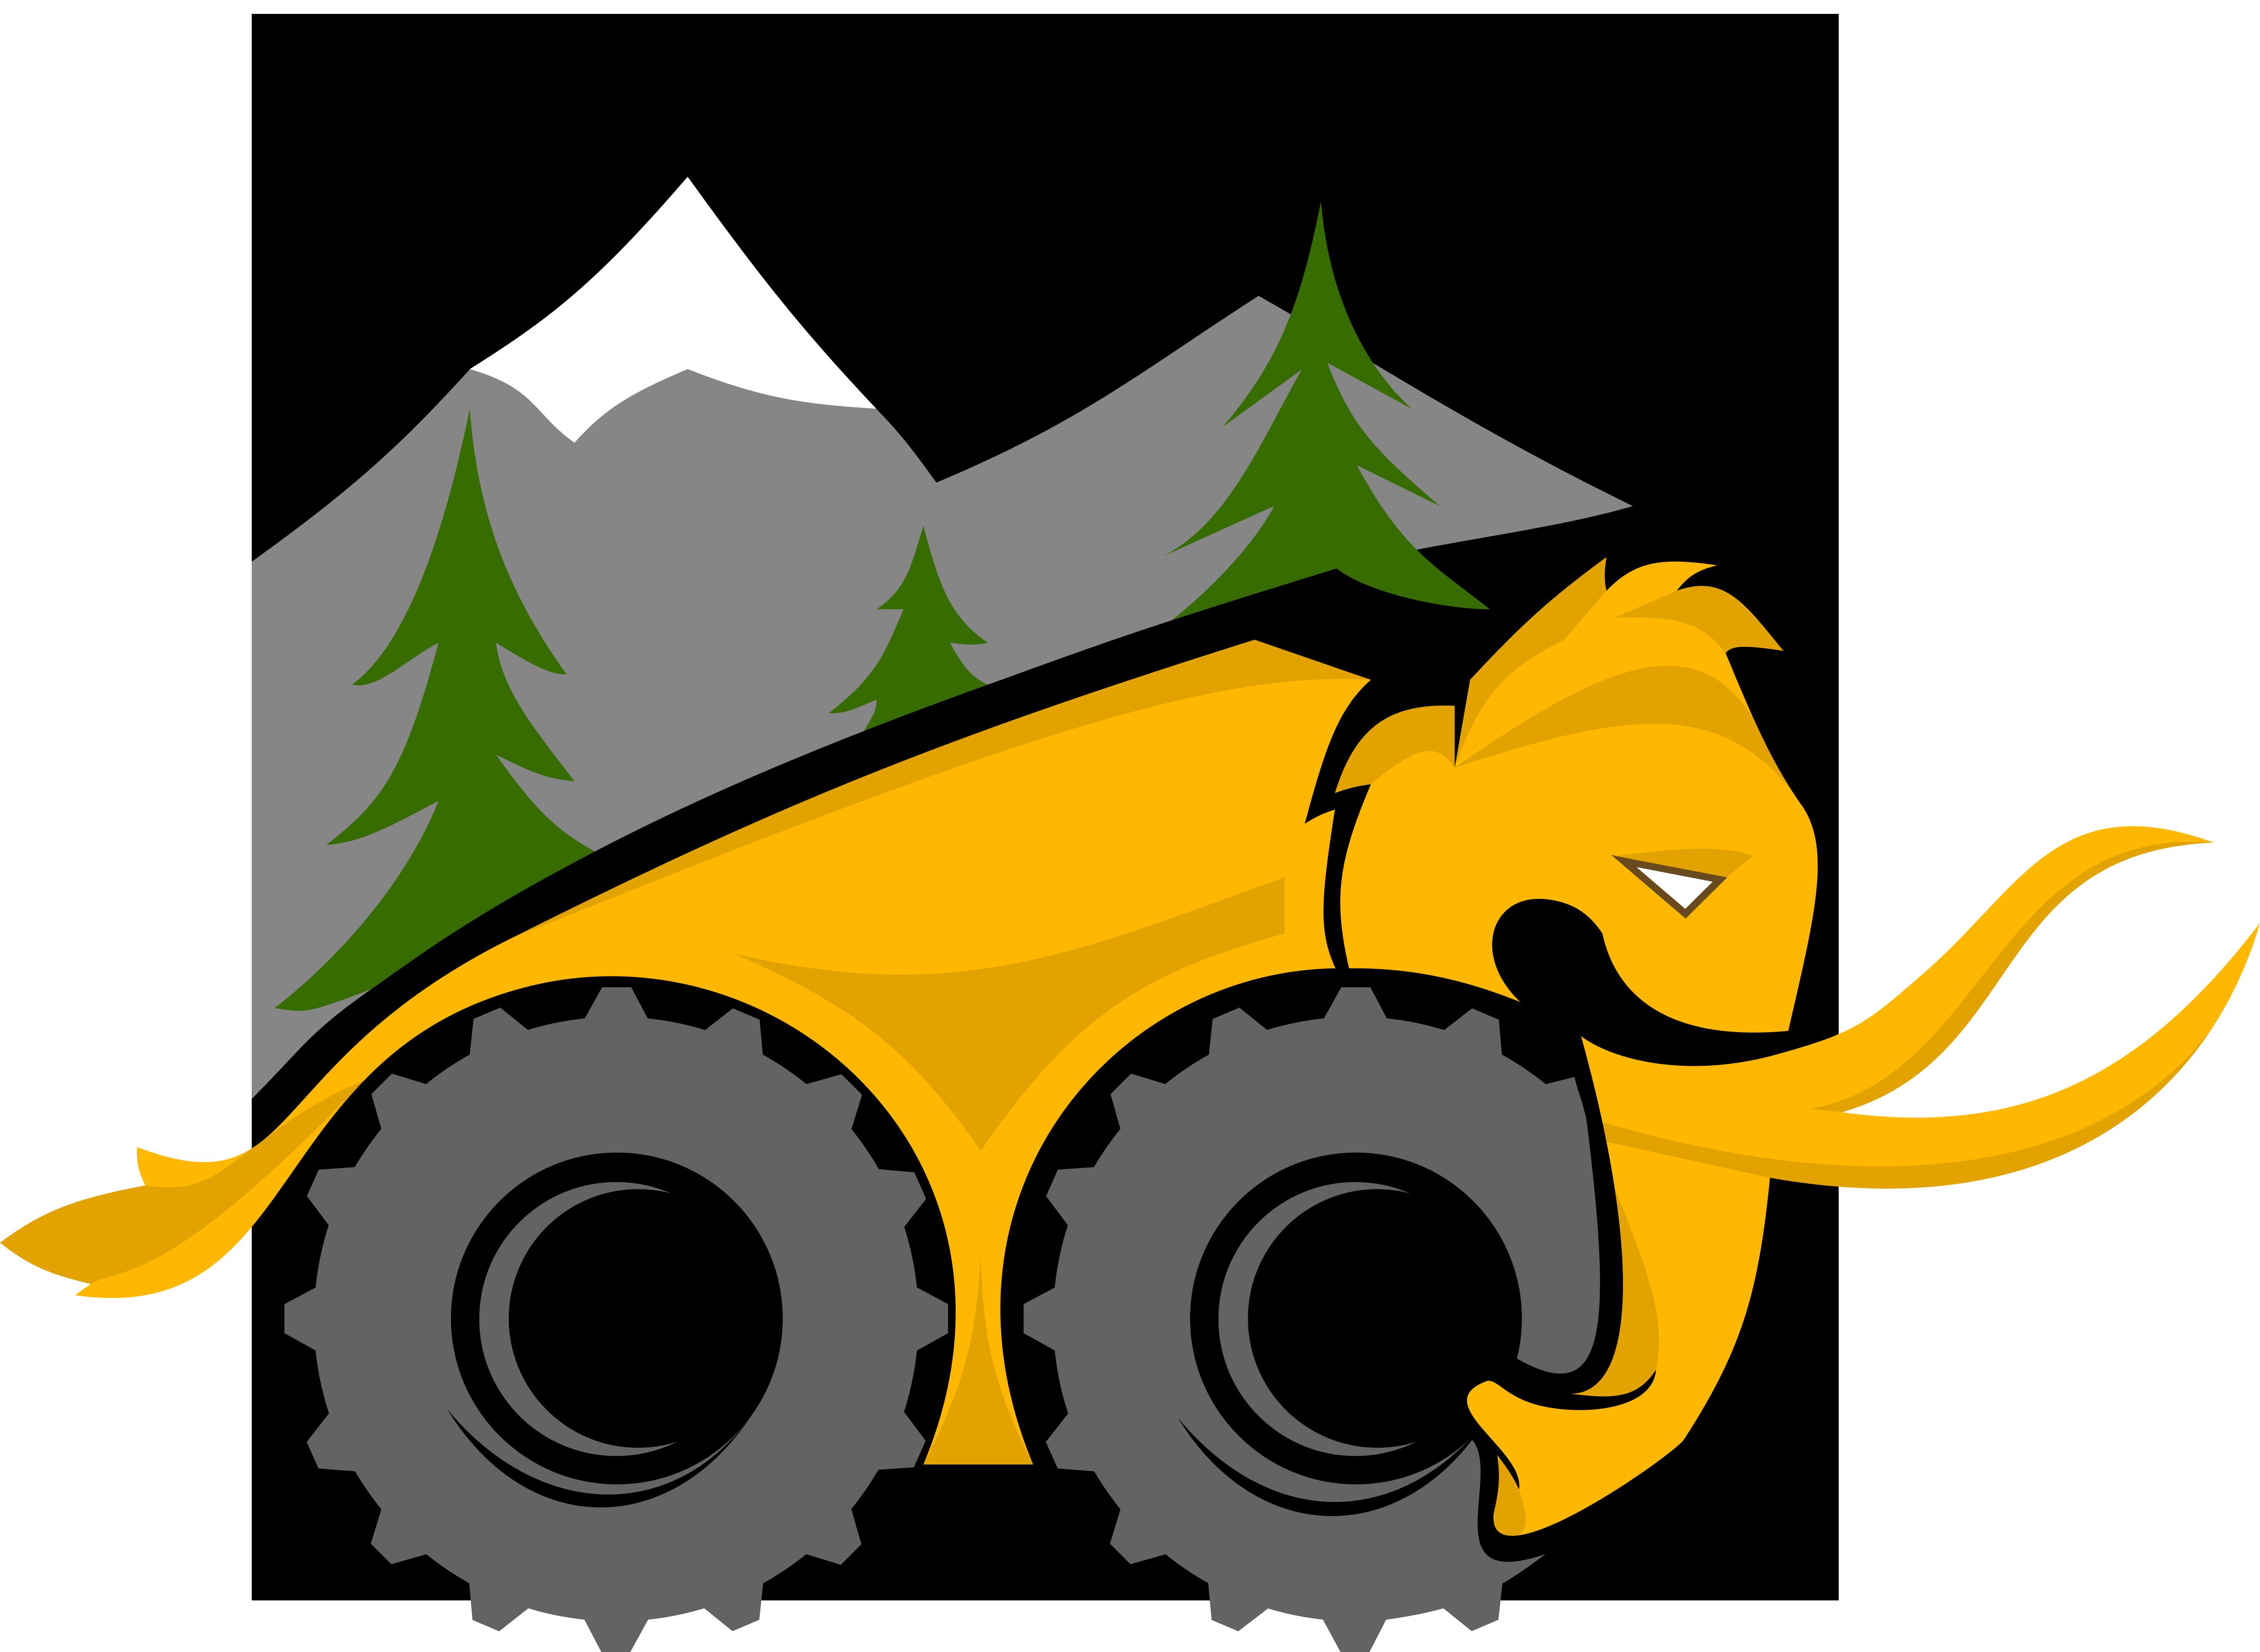 Разработать логотип для вездехода фото f_0135f87e28d60423.jpg